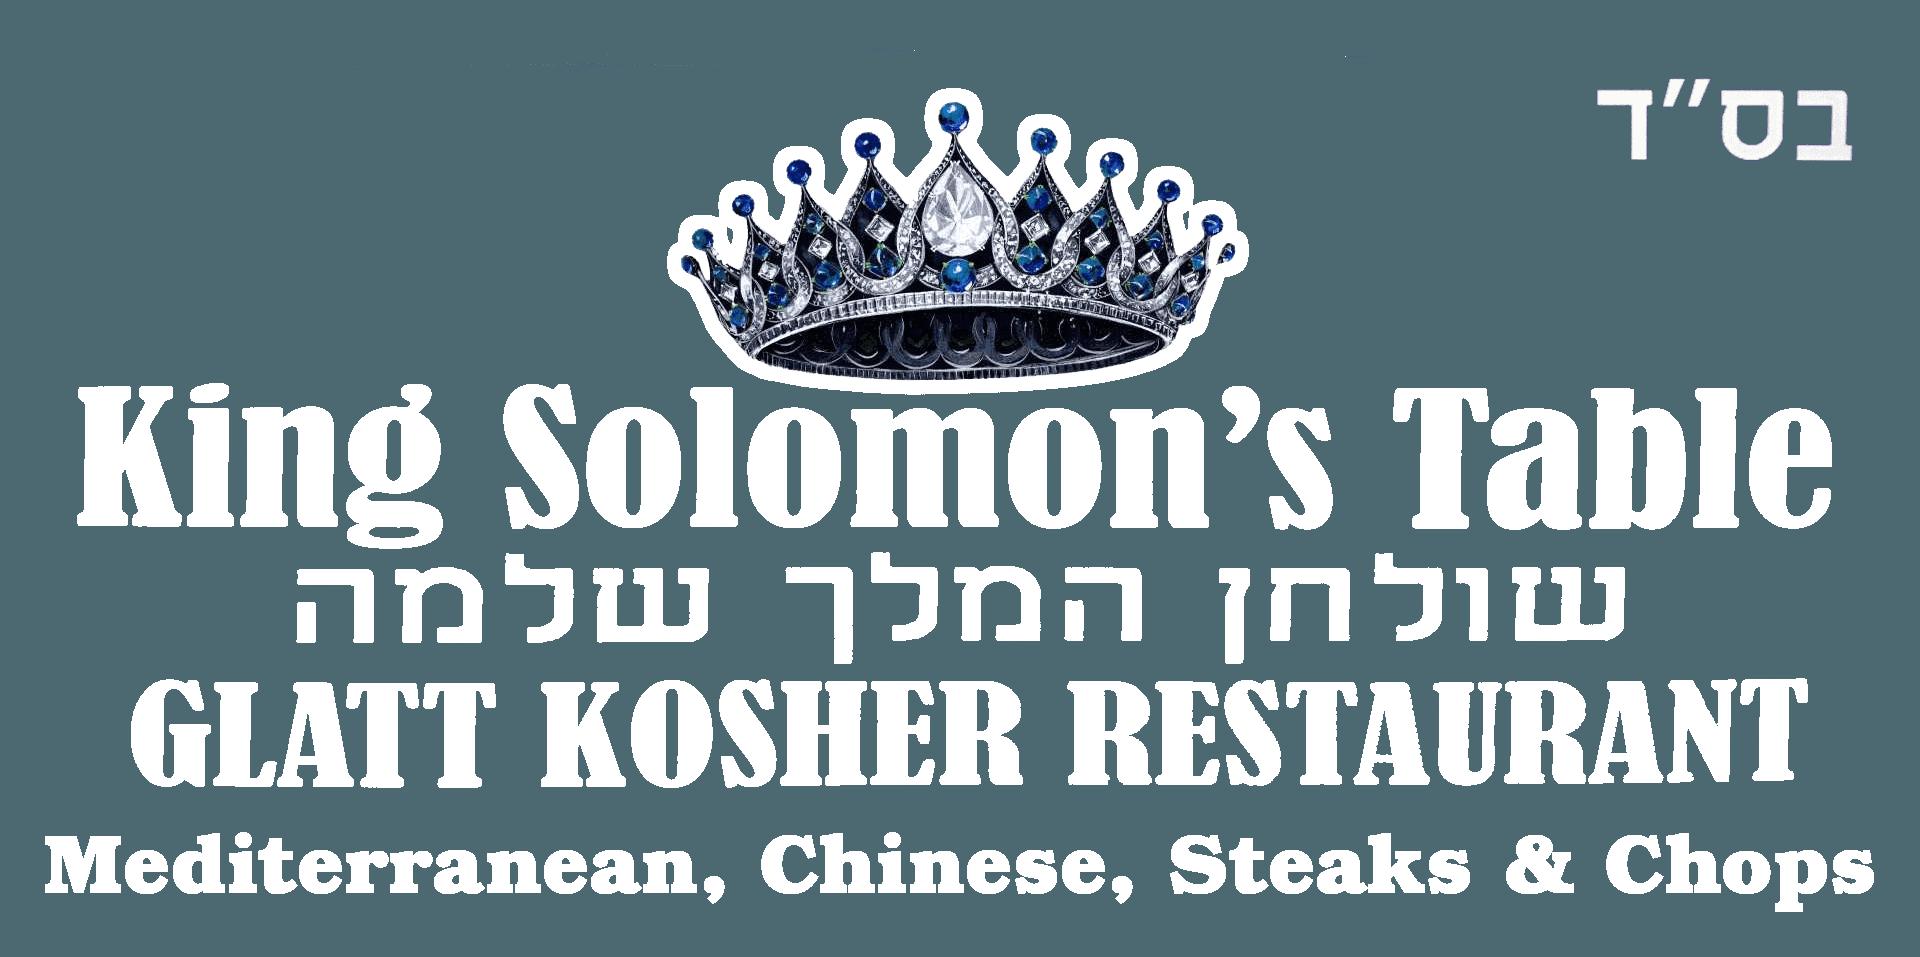 King Solomon's Table - logo